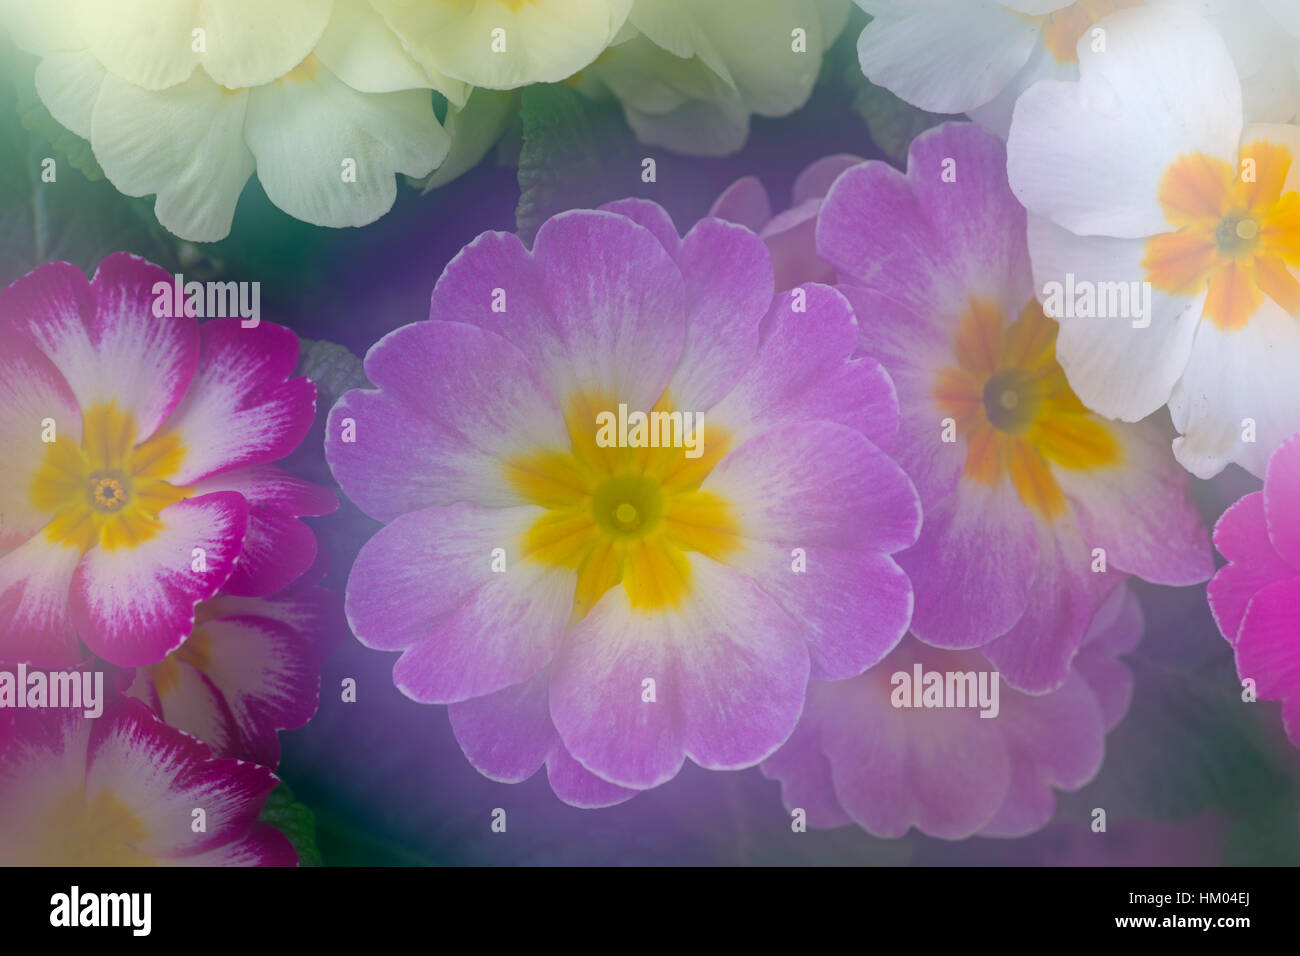 Polyanthus photographed using multi exposures - Stock Image